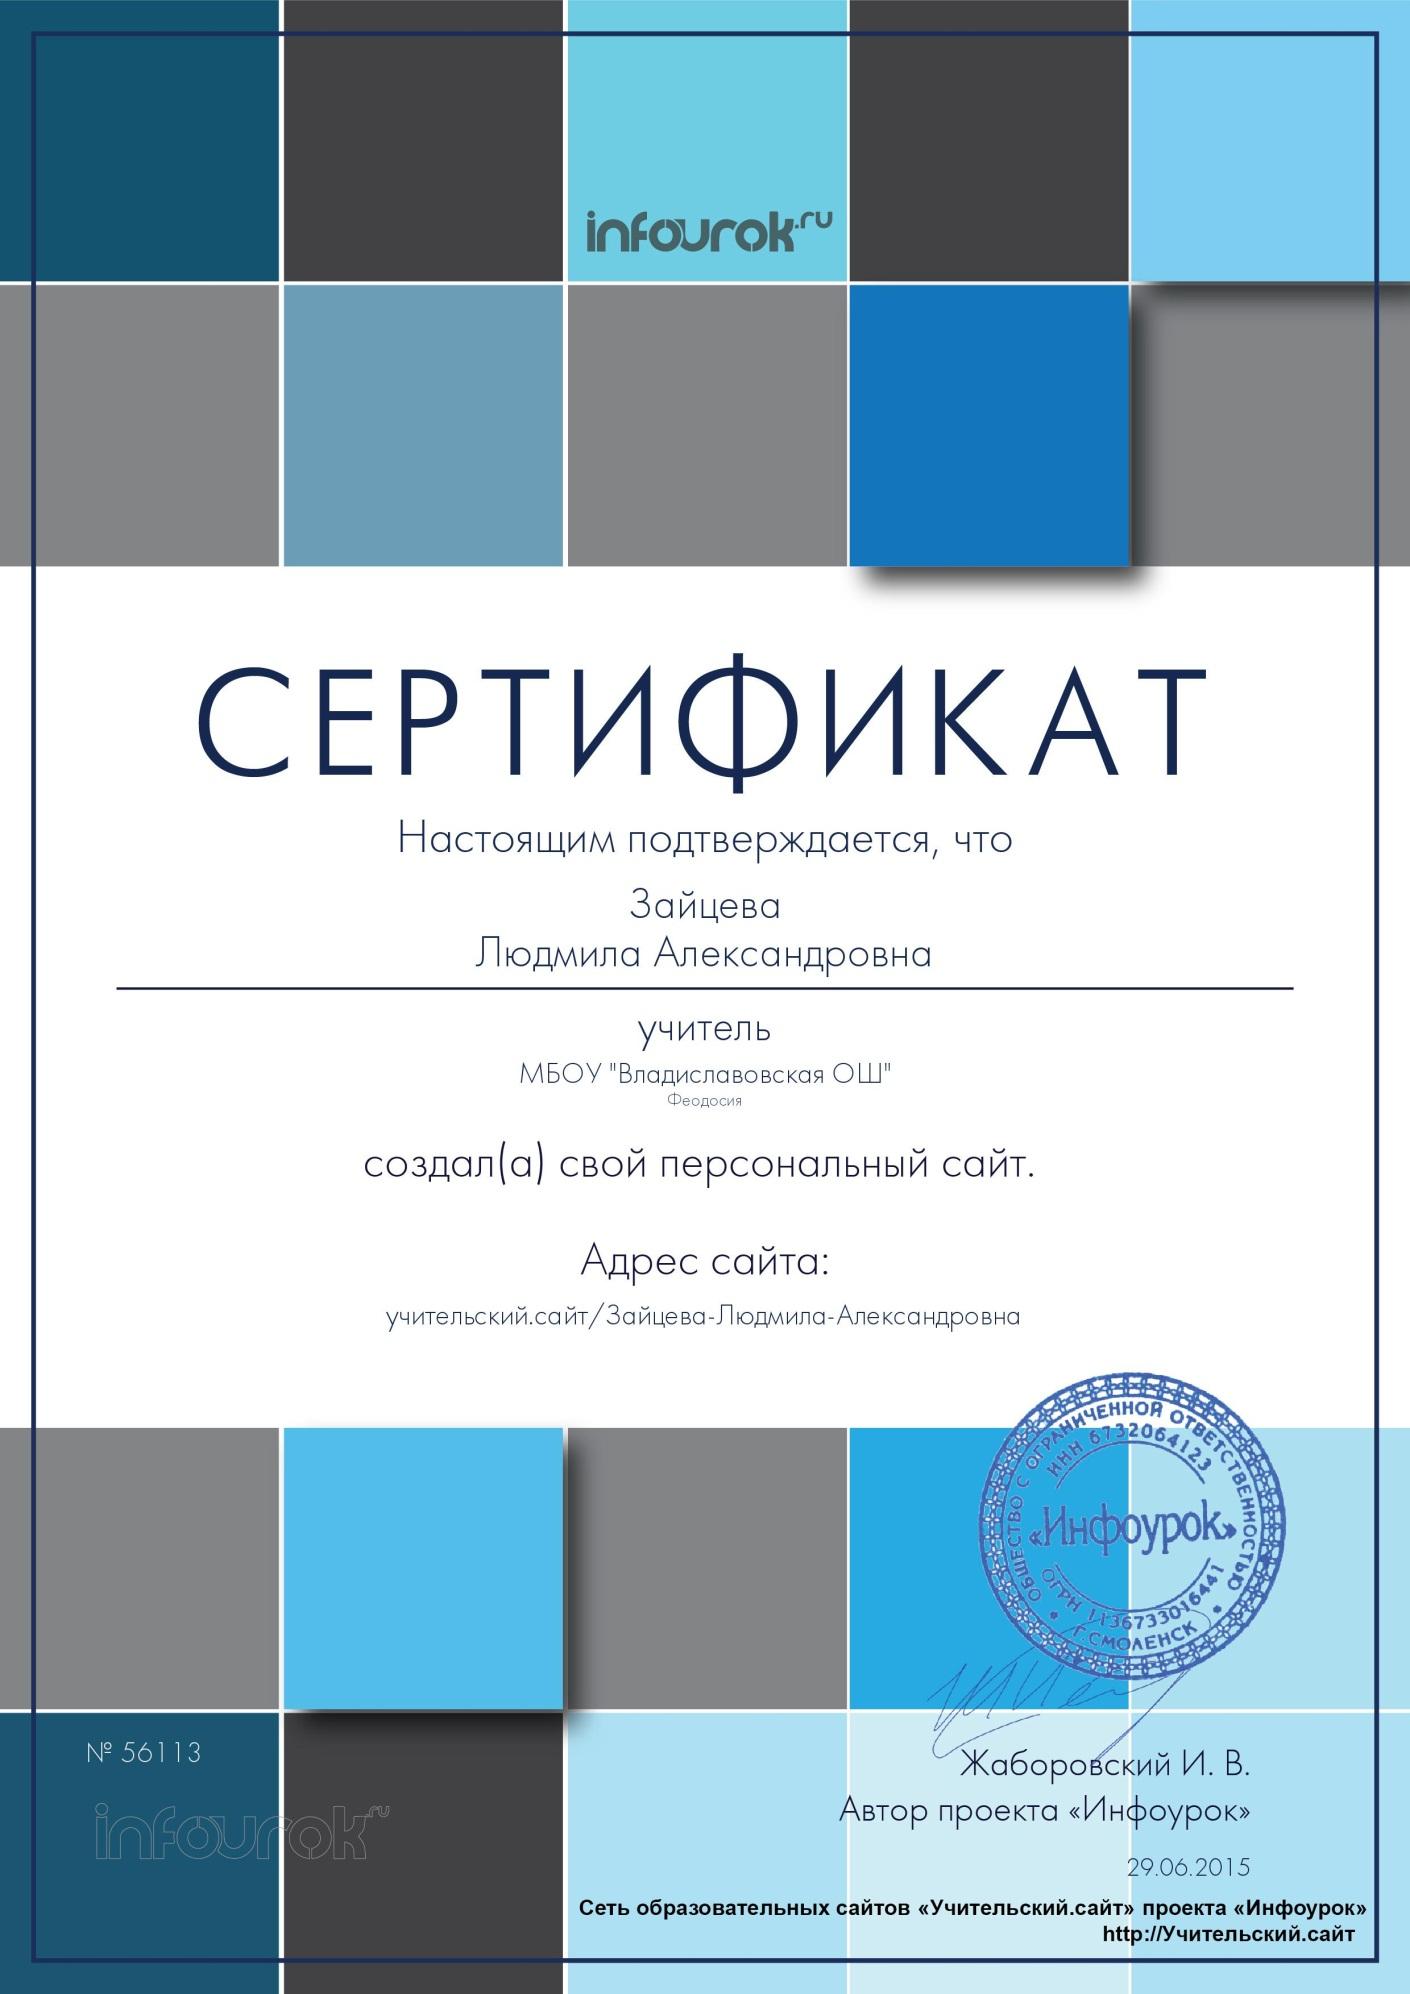 D:\школа\аттестация\Сертификат проекта infourok.ru № 56113.jpg